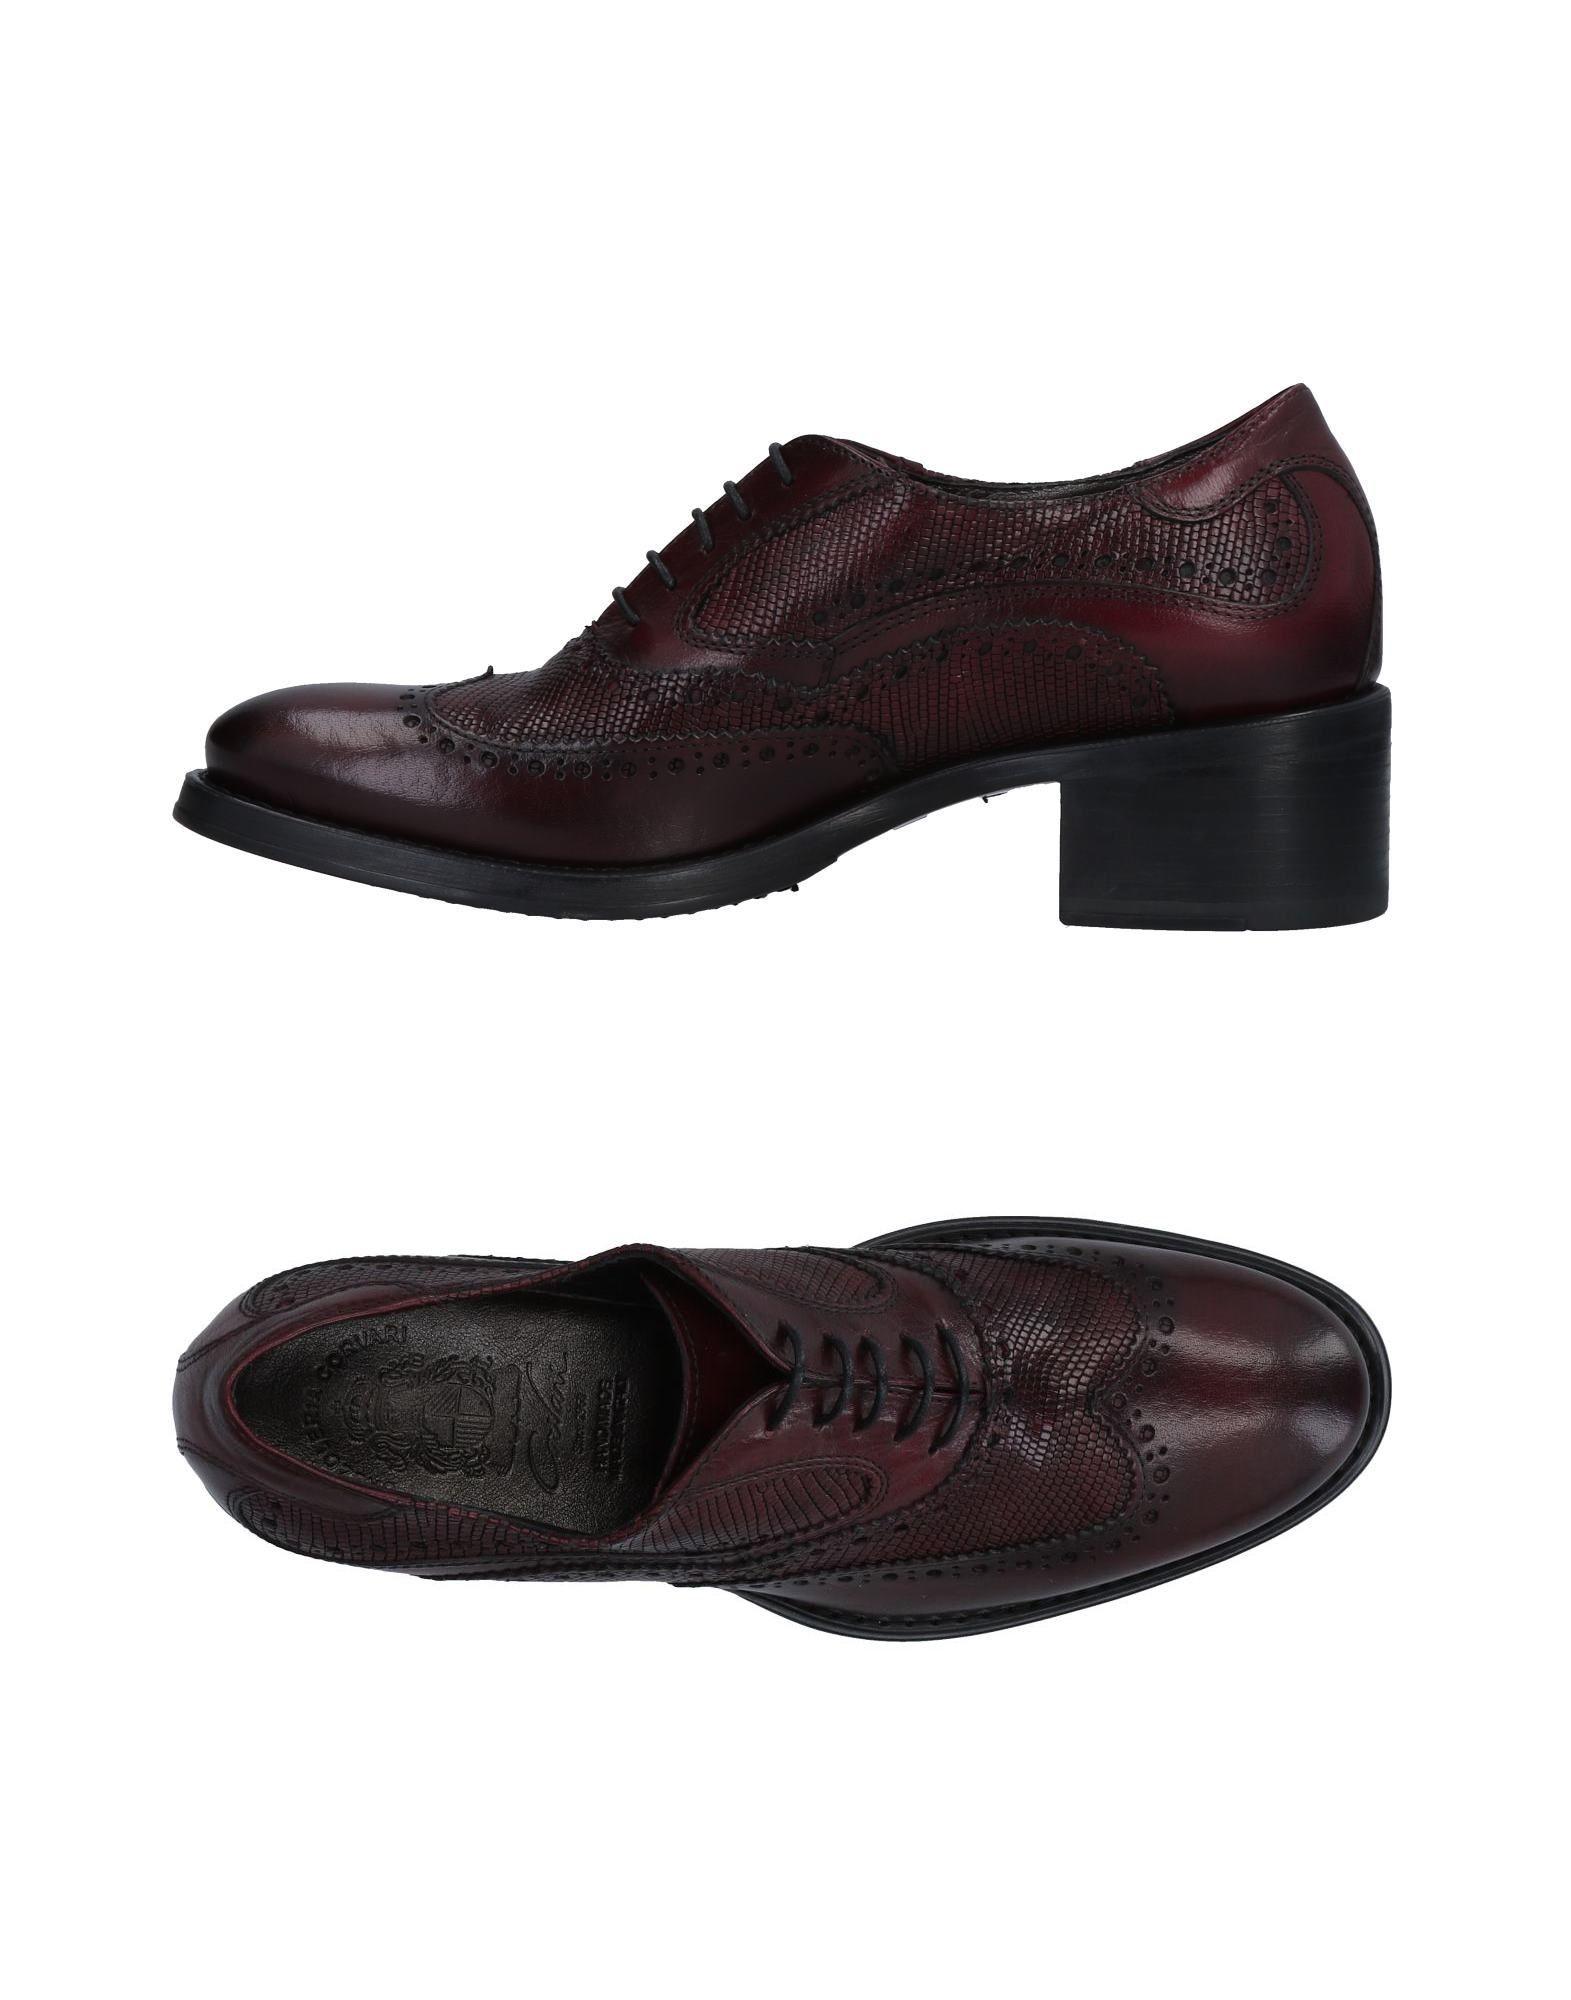 CORVARI Обувь на шнурках первый внутри обувь обувь обувь обувь обувь обувь обувь обувь обувь 8a2549 мужская армия green 40 метров